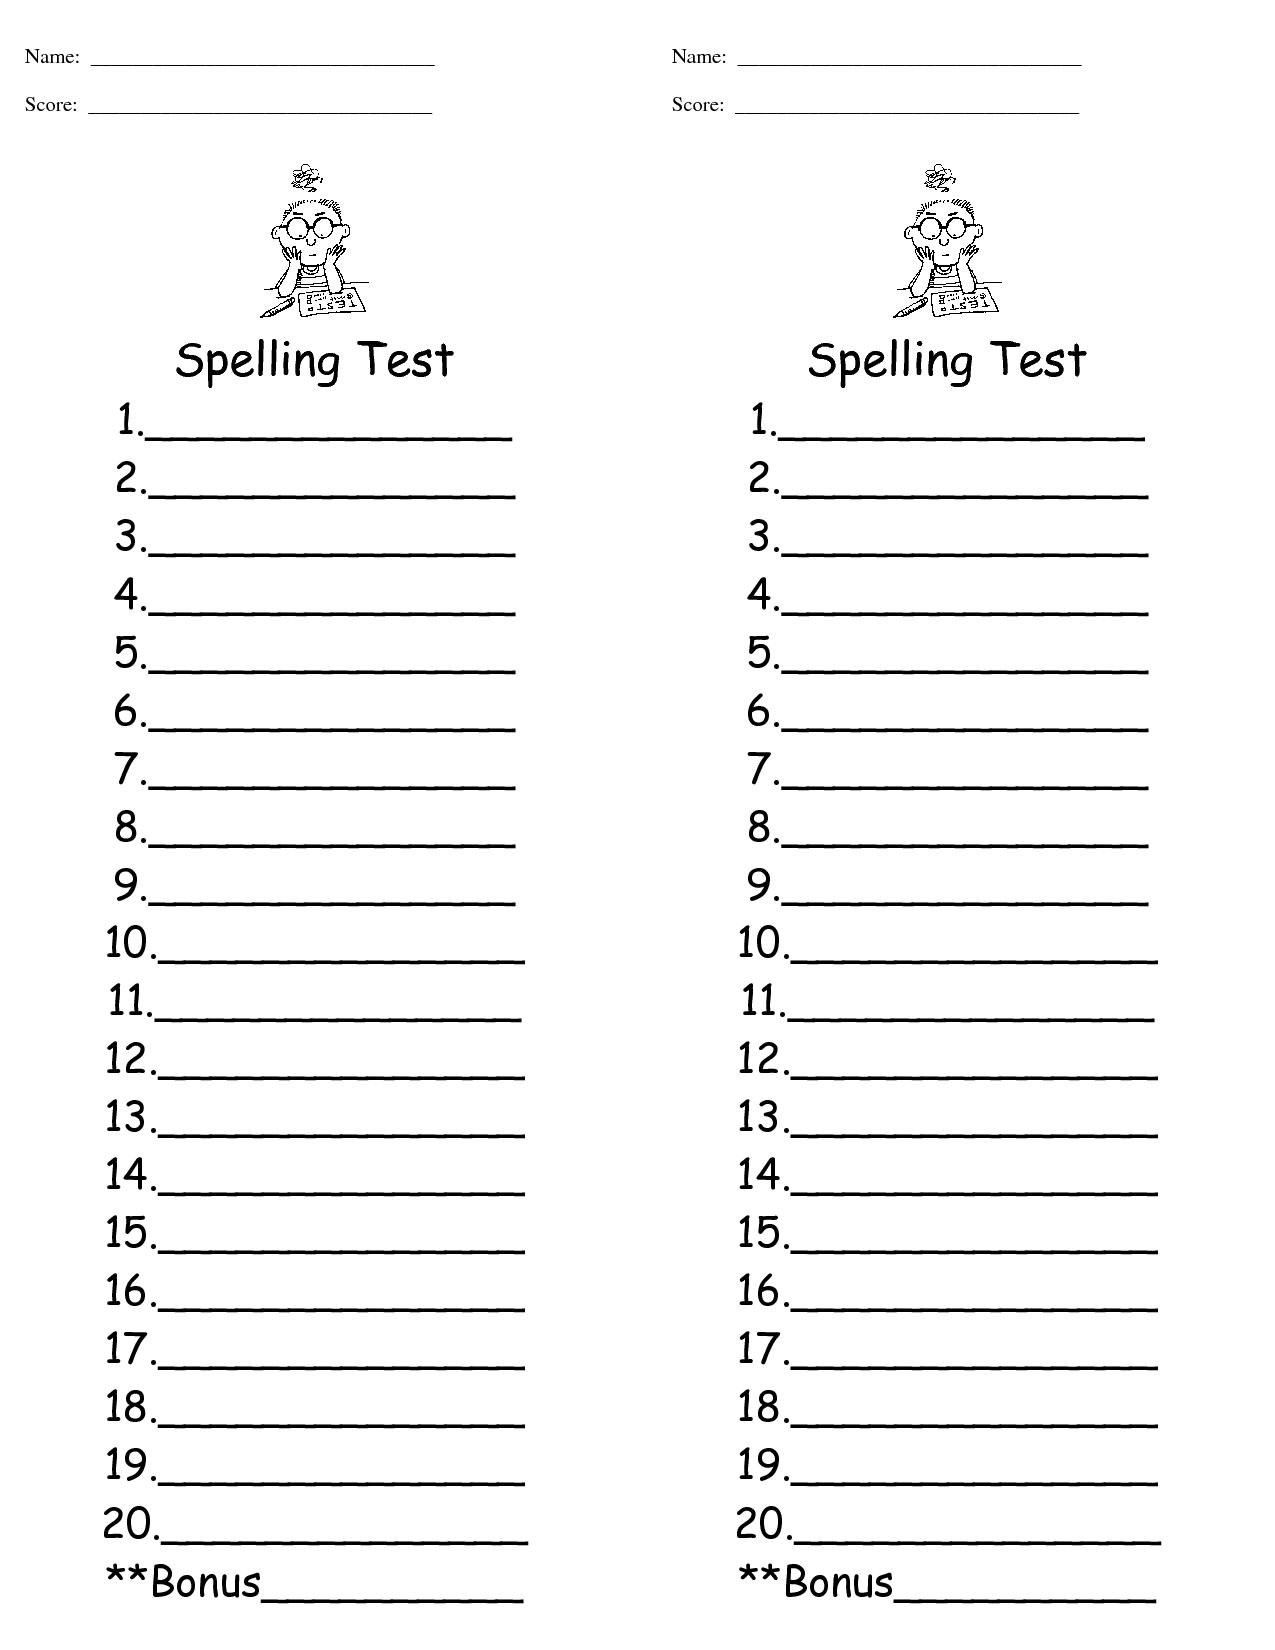 Free Spelling Spiral Worksheet